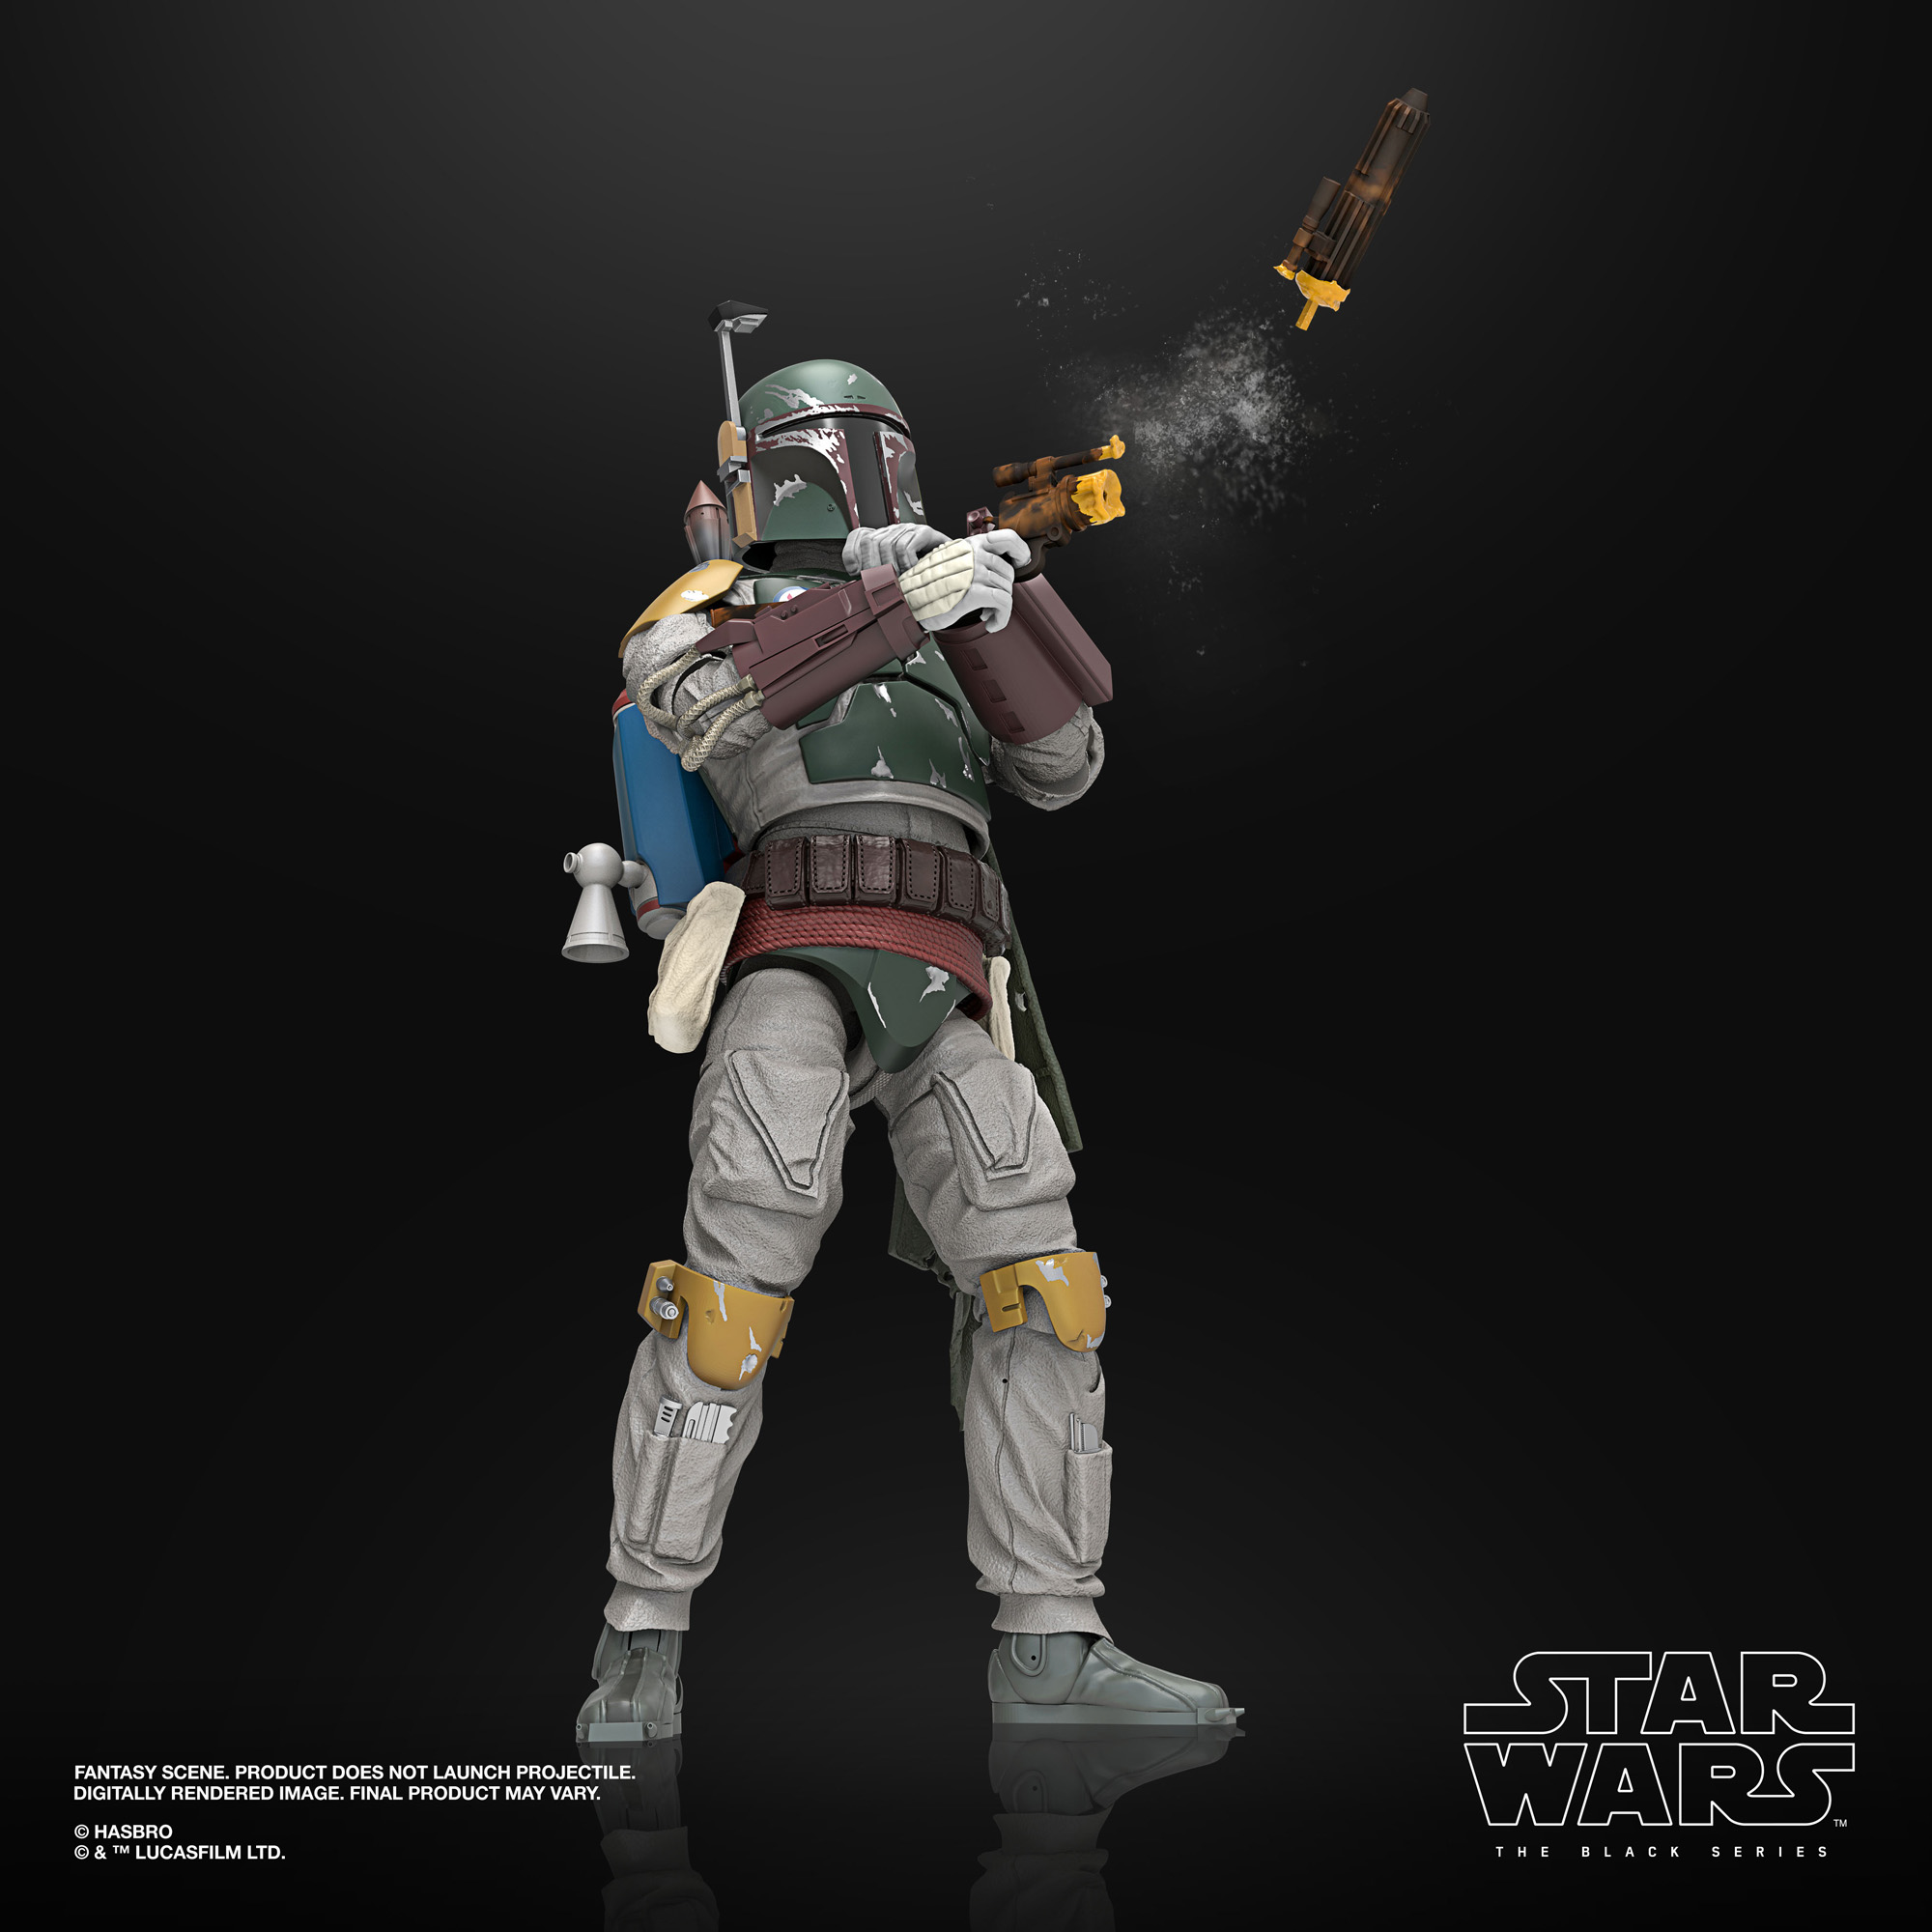 Star Wars The Black Series Boba Fett Deluxe F12715L00 5010993804740